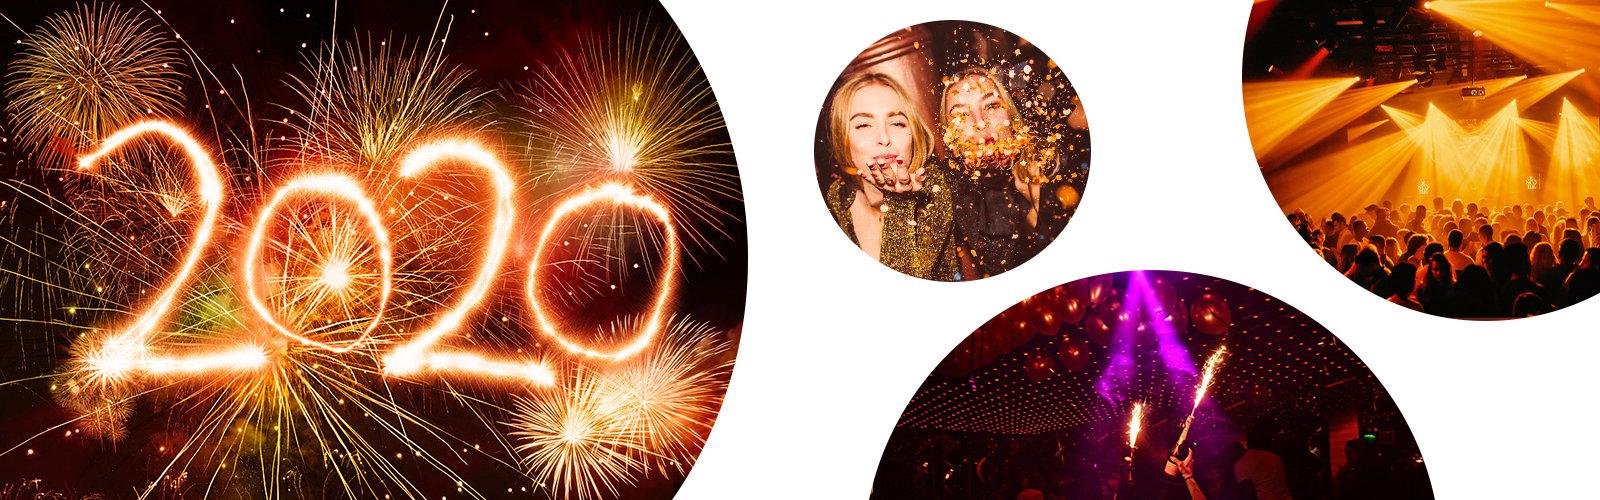 Amstedam Nightlife New Years Eve